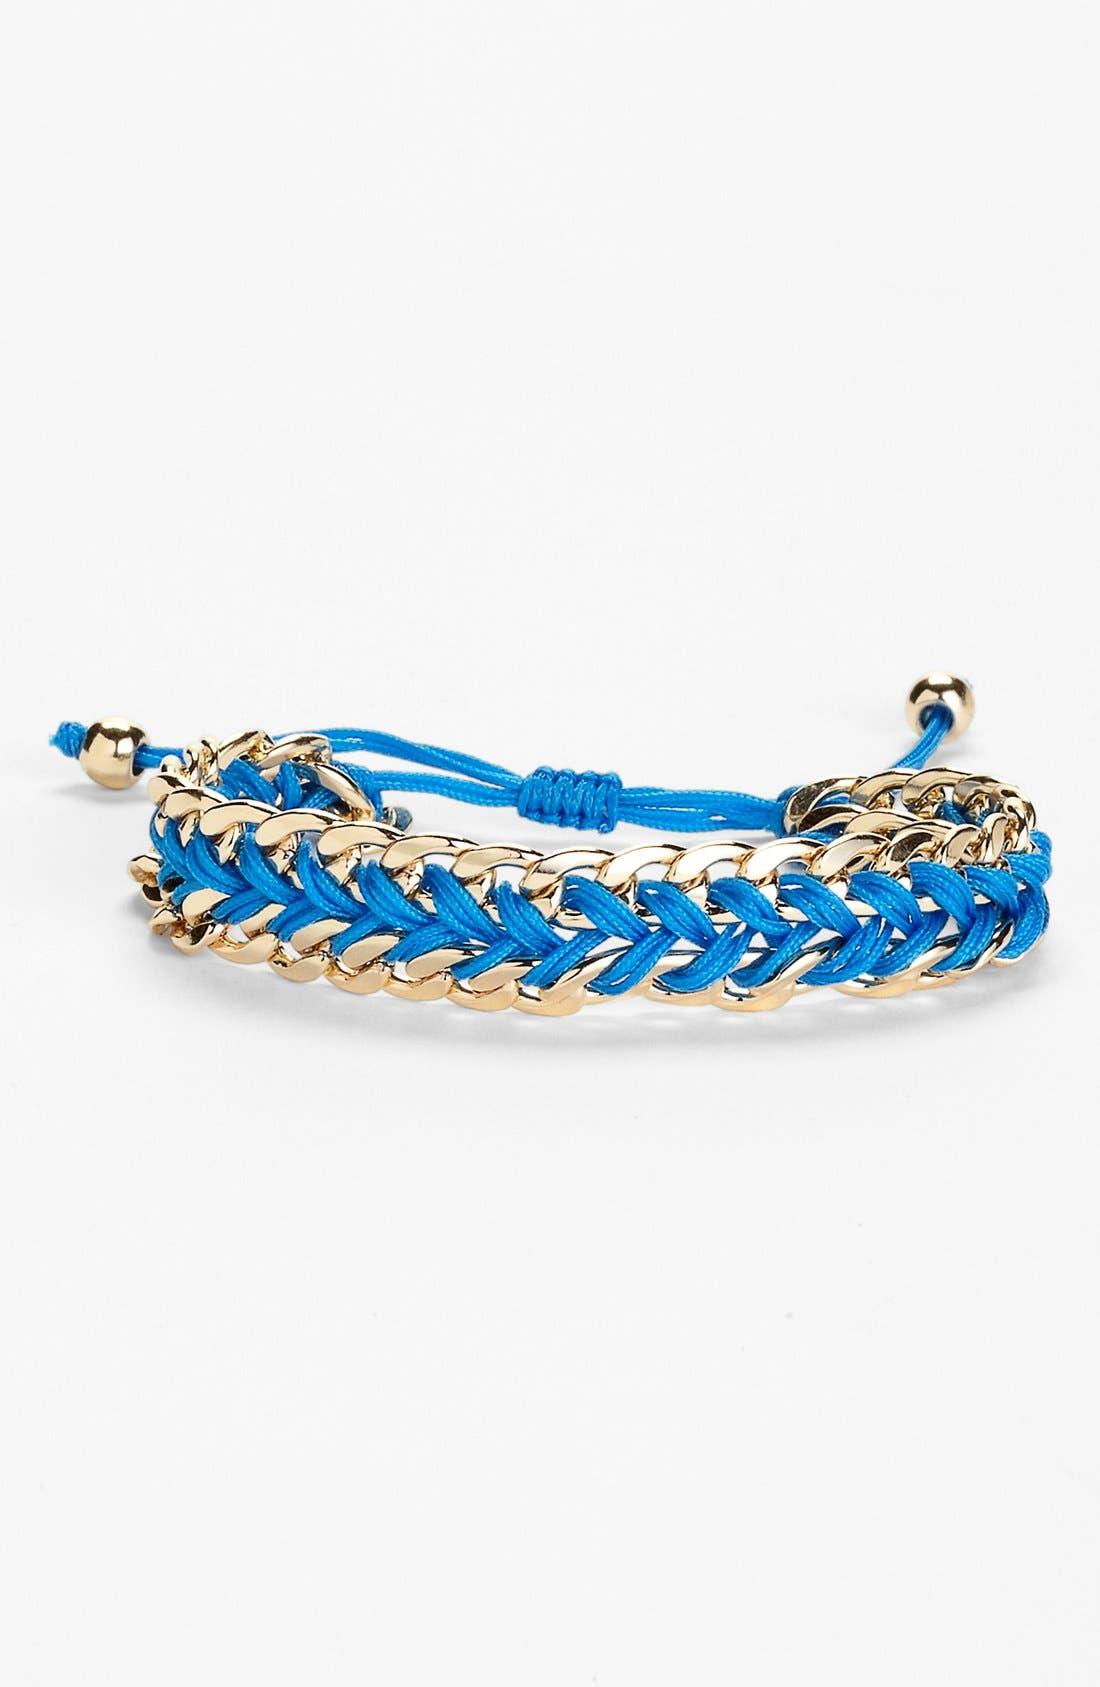 Main Image - Tasha Cord & Link Friendship Bracelet